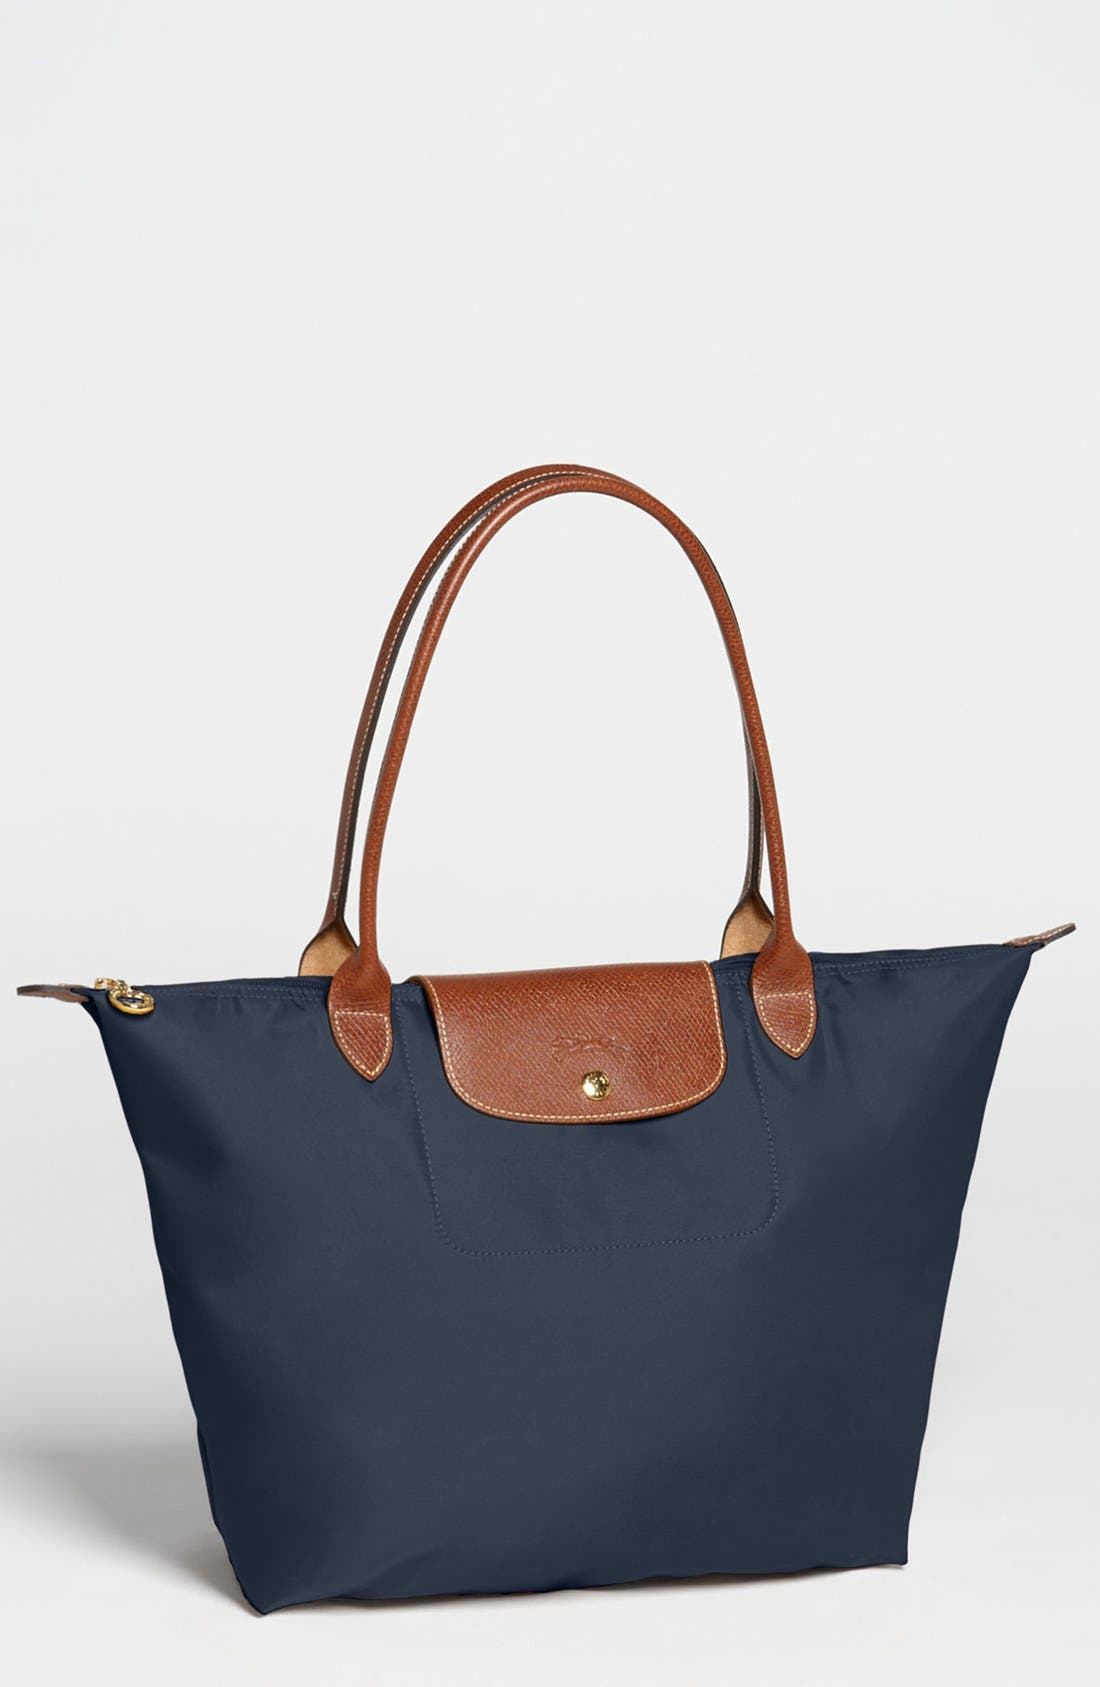 Alternate Image 1 Selected - Longchamp 'Large Le Pliage' Tote